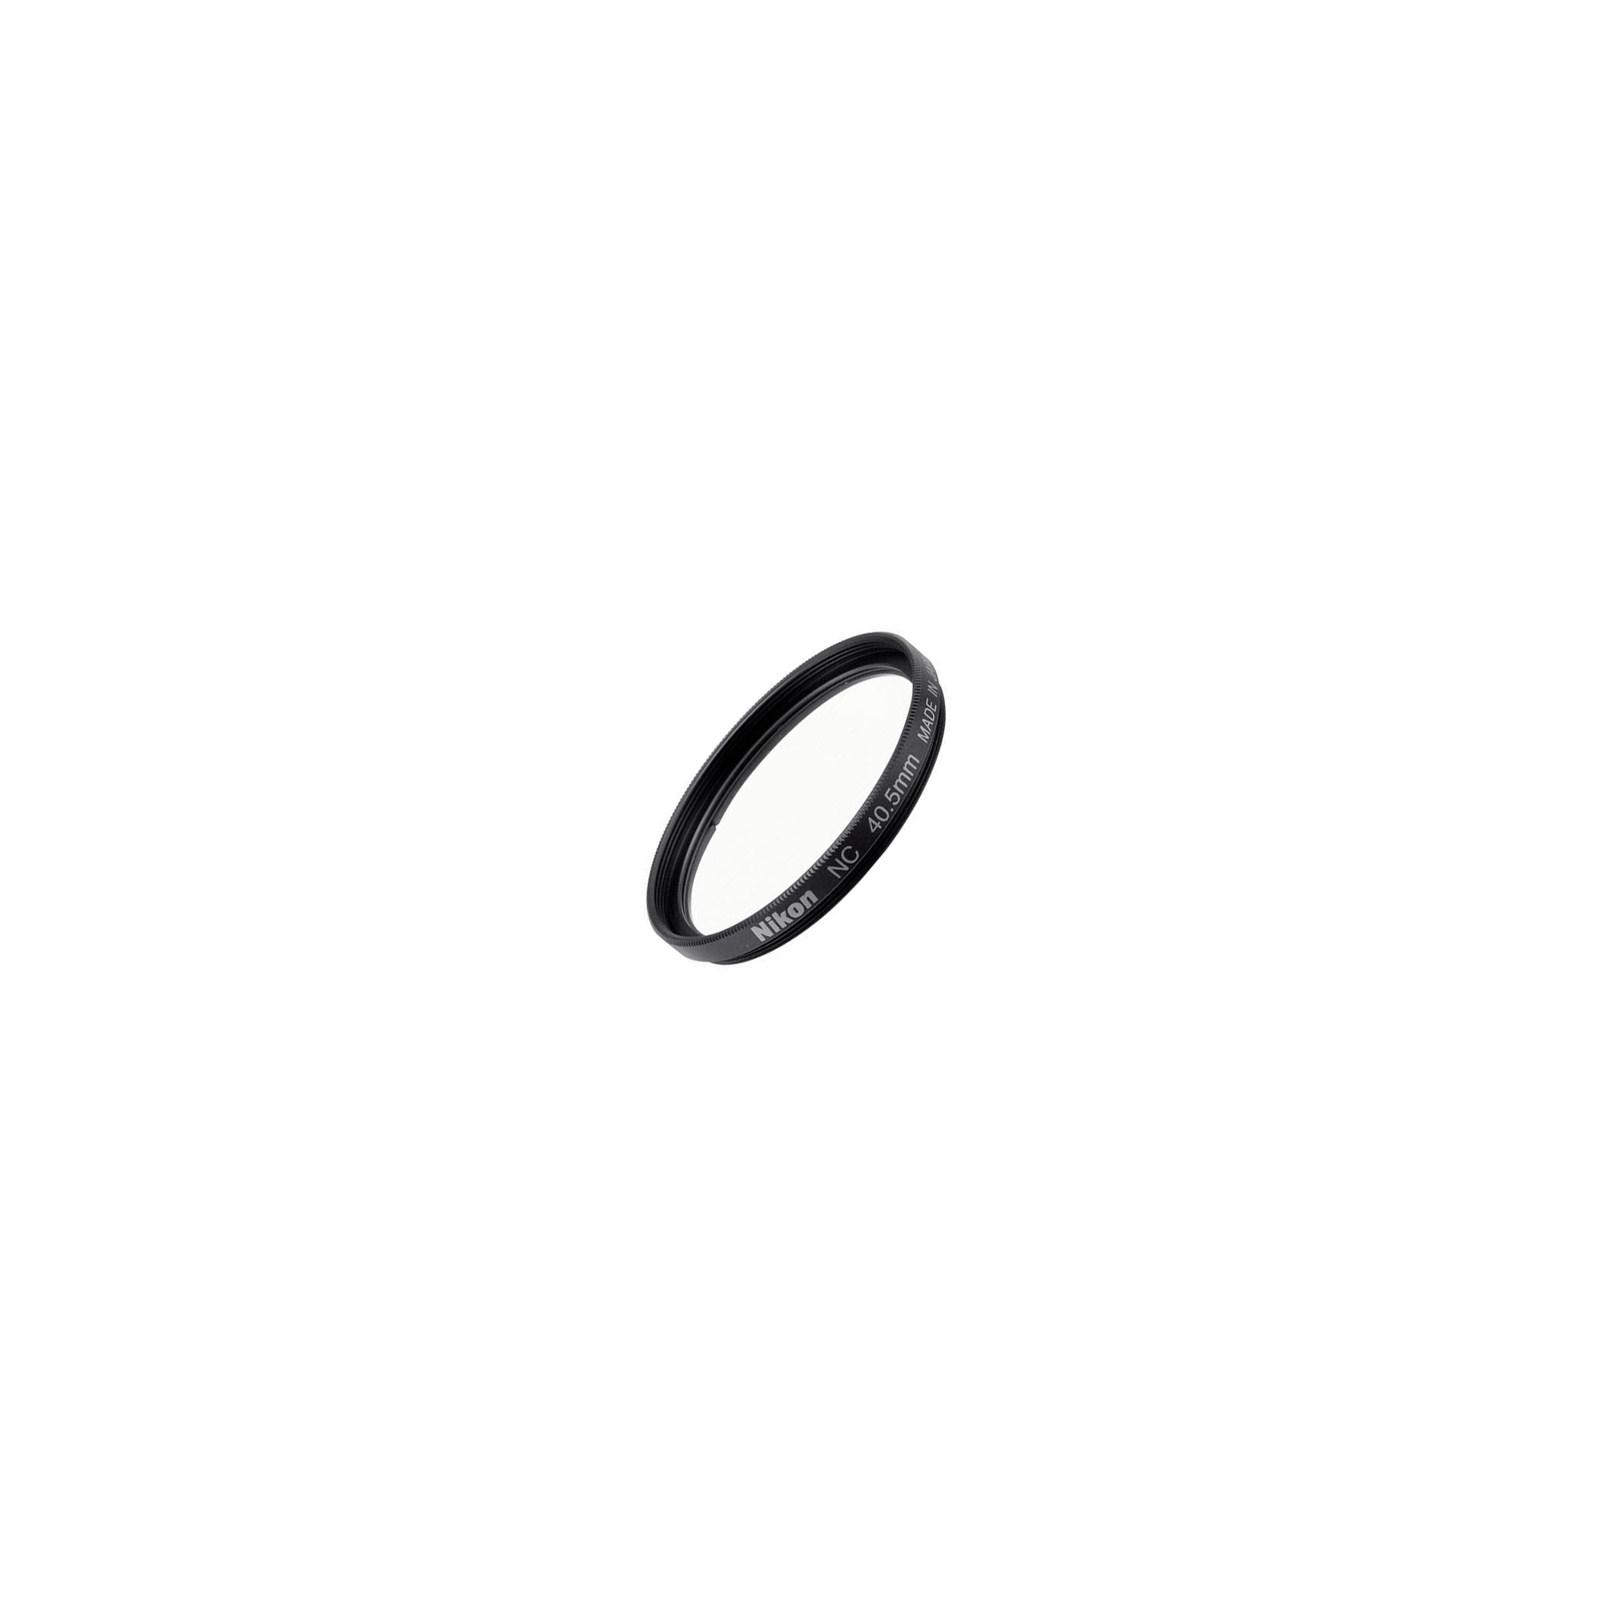 Светофильтр Nikon NC 40.5mm (FTA08201)